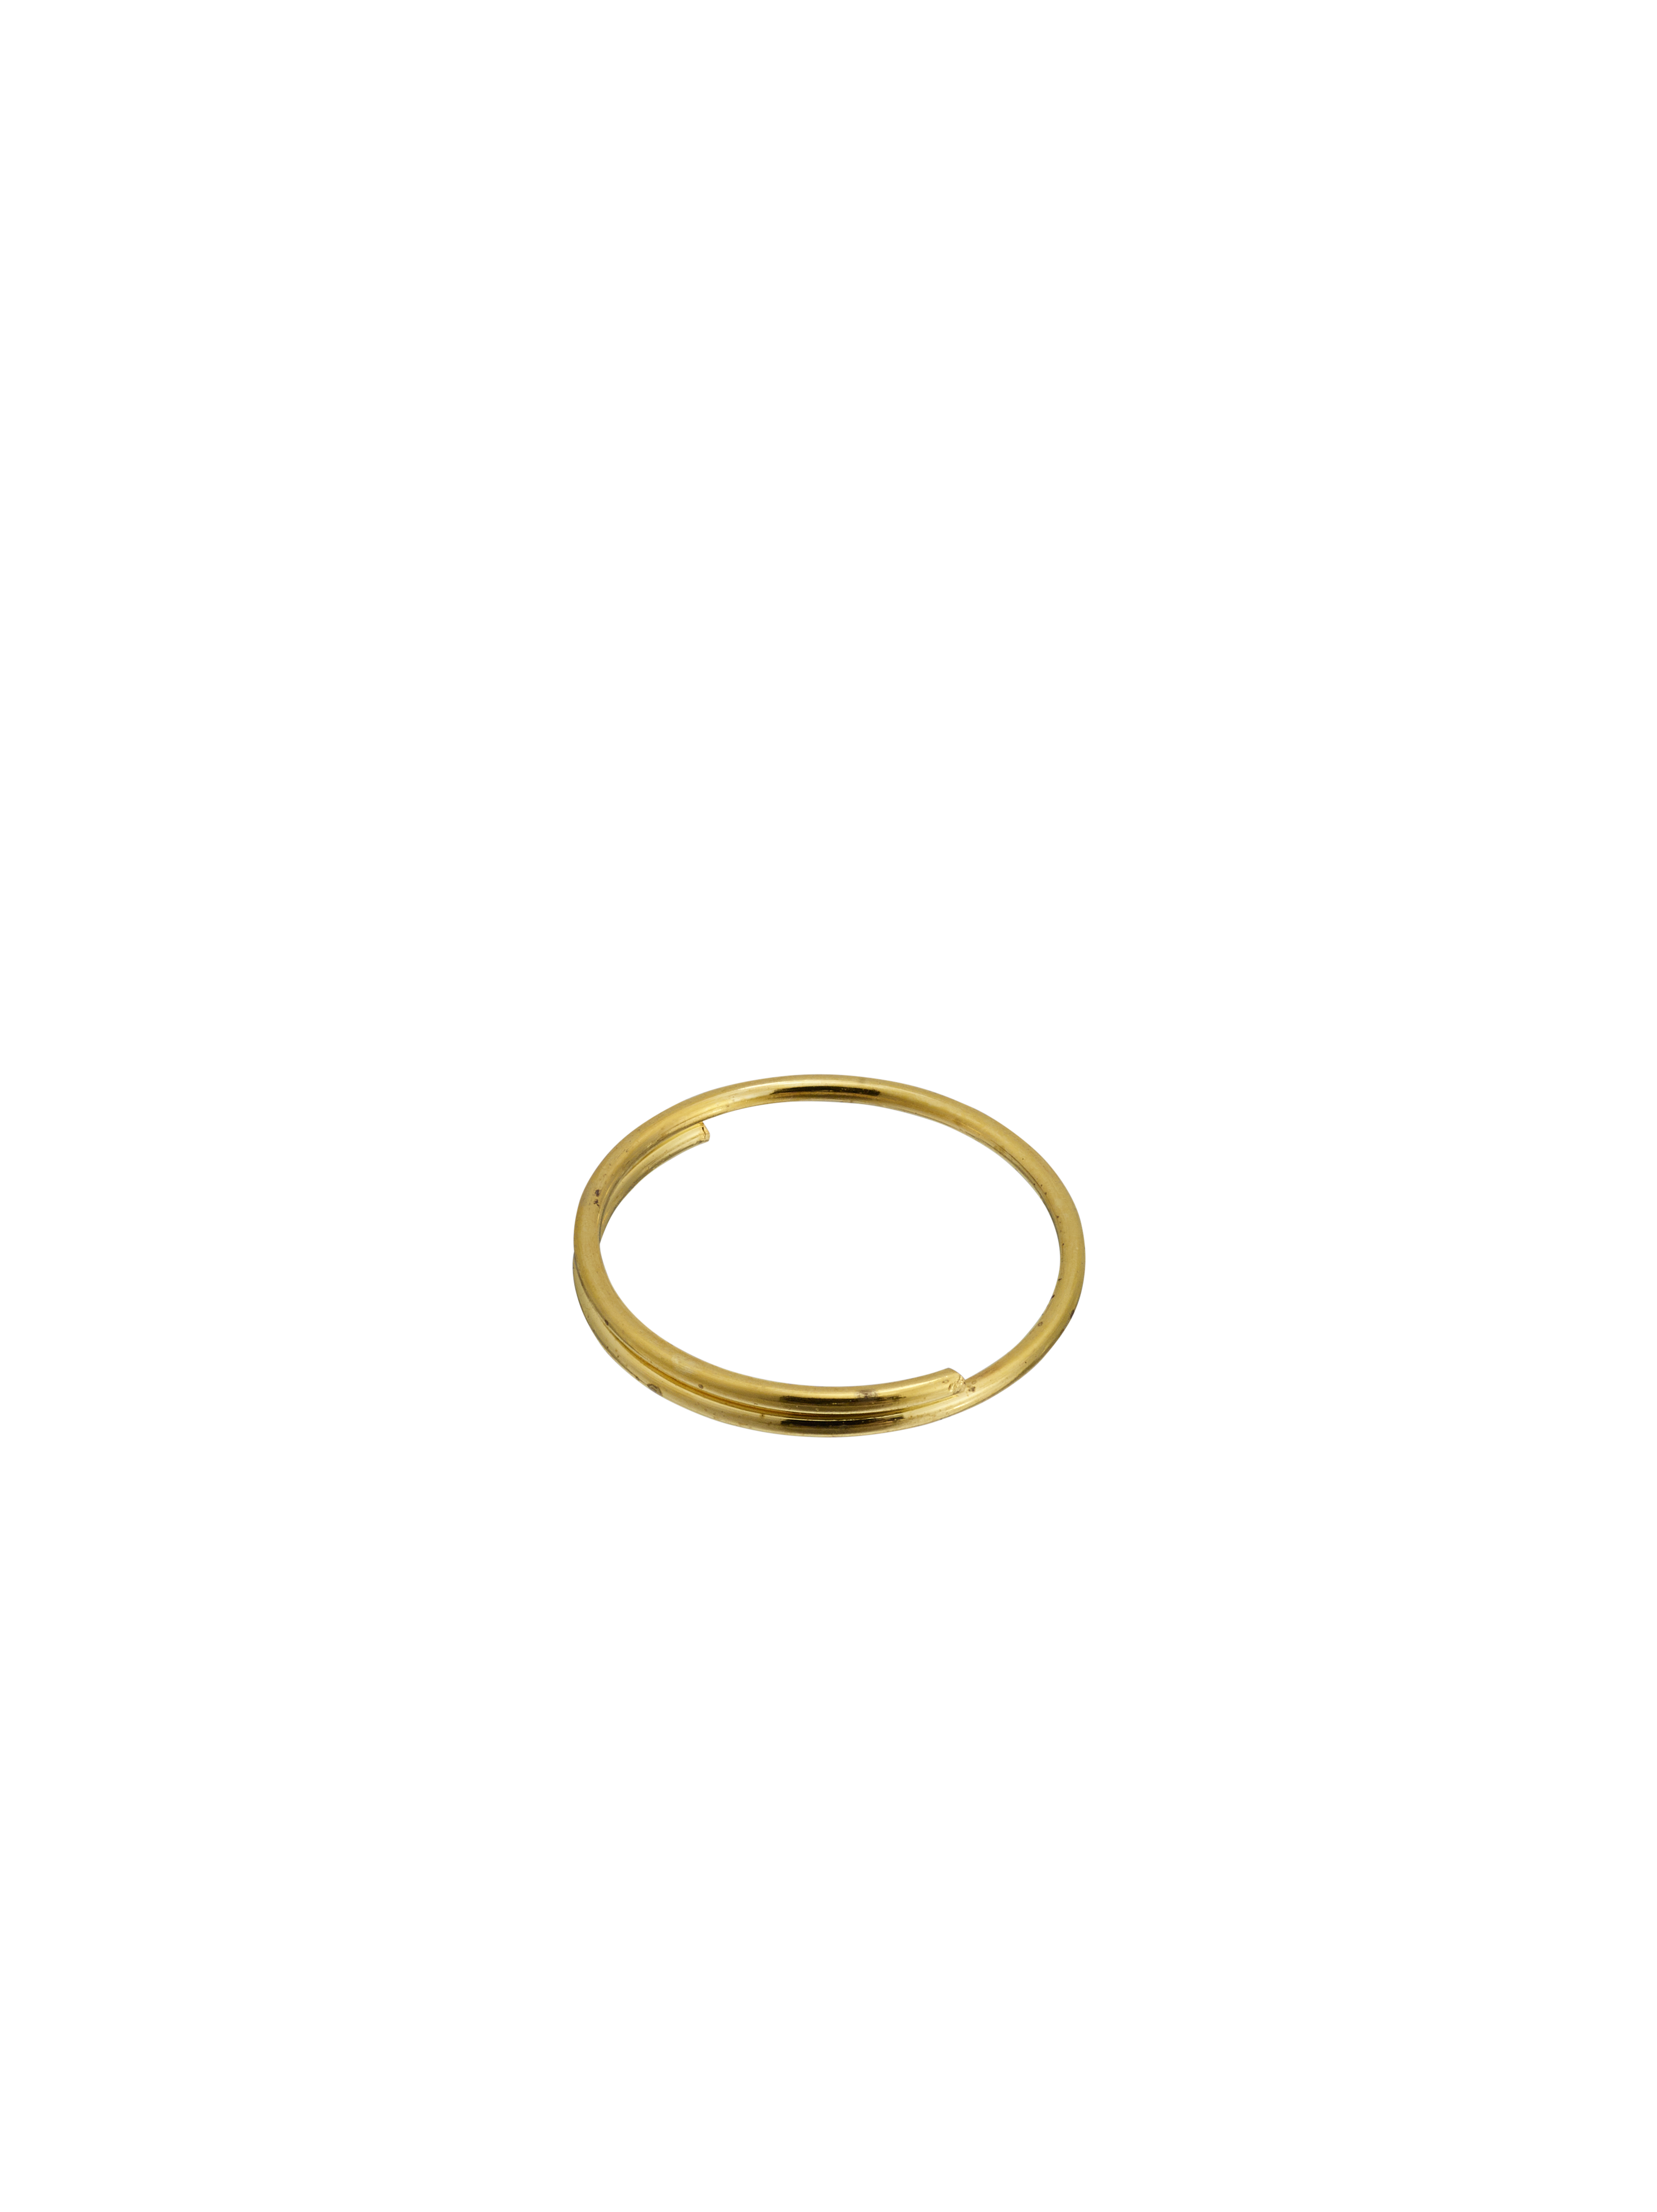 RING to prism, Gold